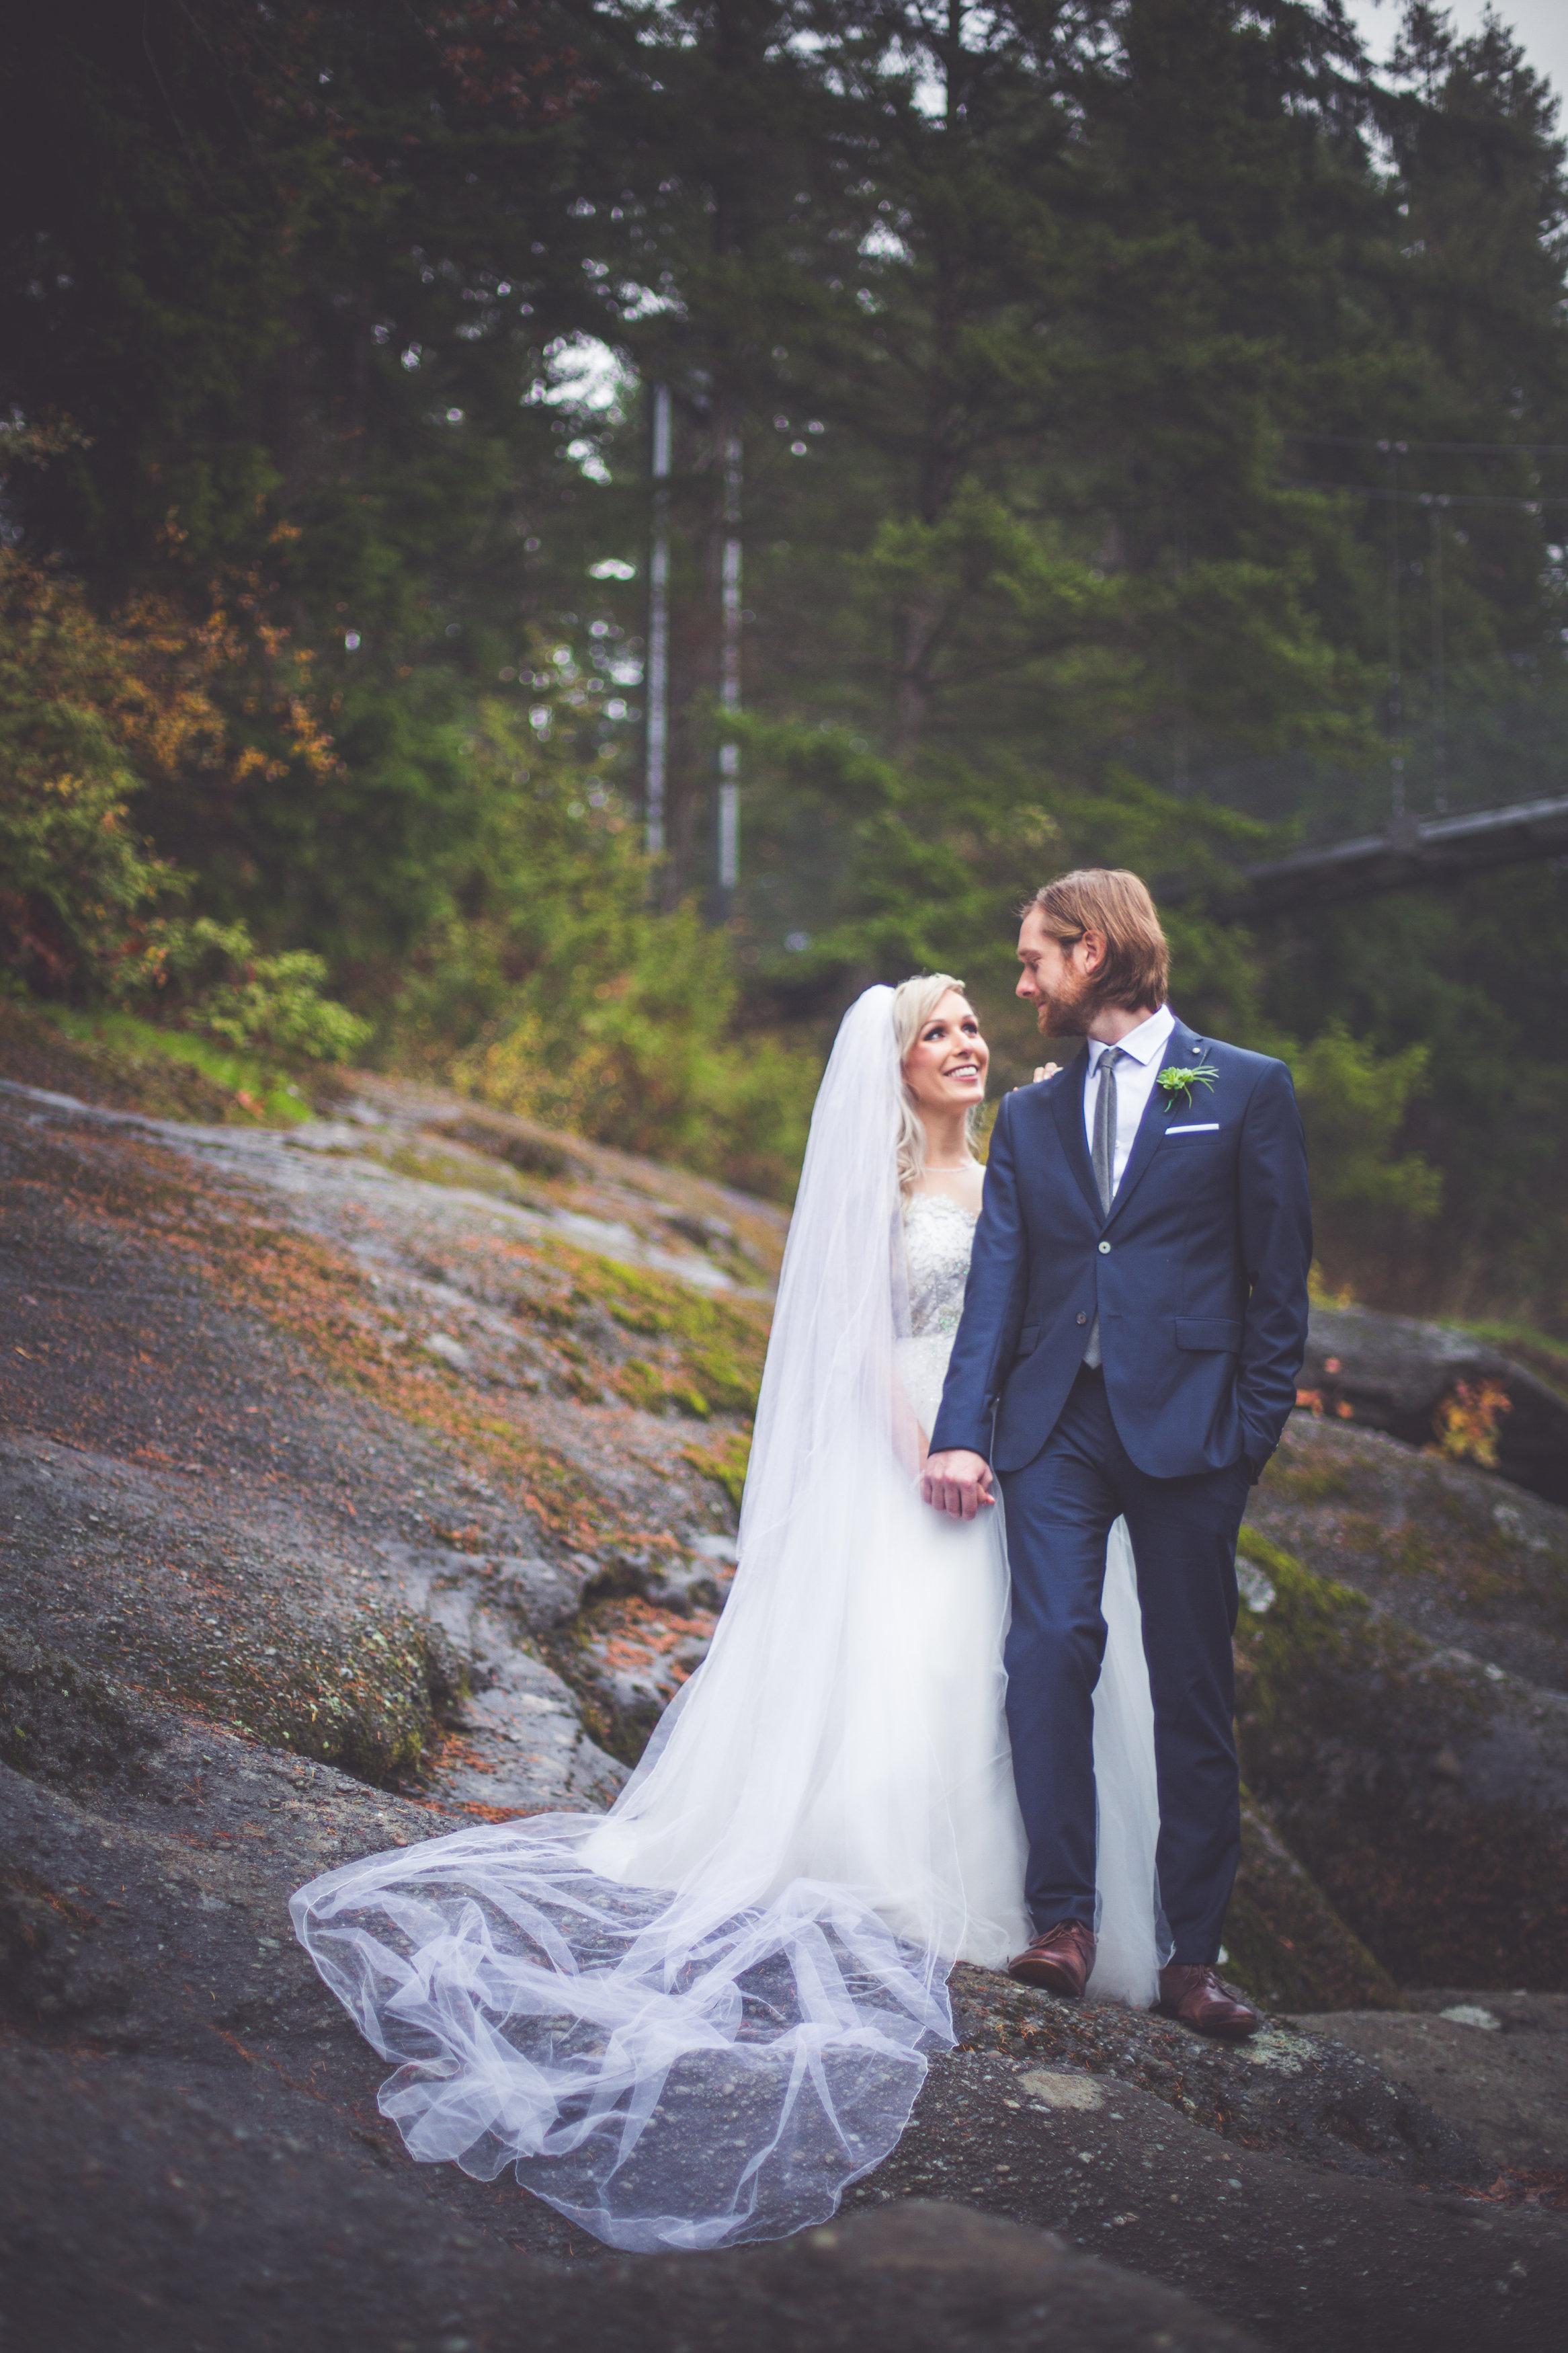 whimsical-romantic-wedding-top-bridge-13.jpg